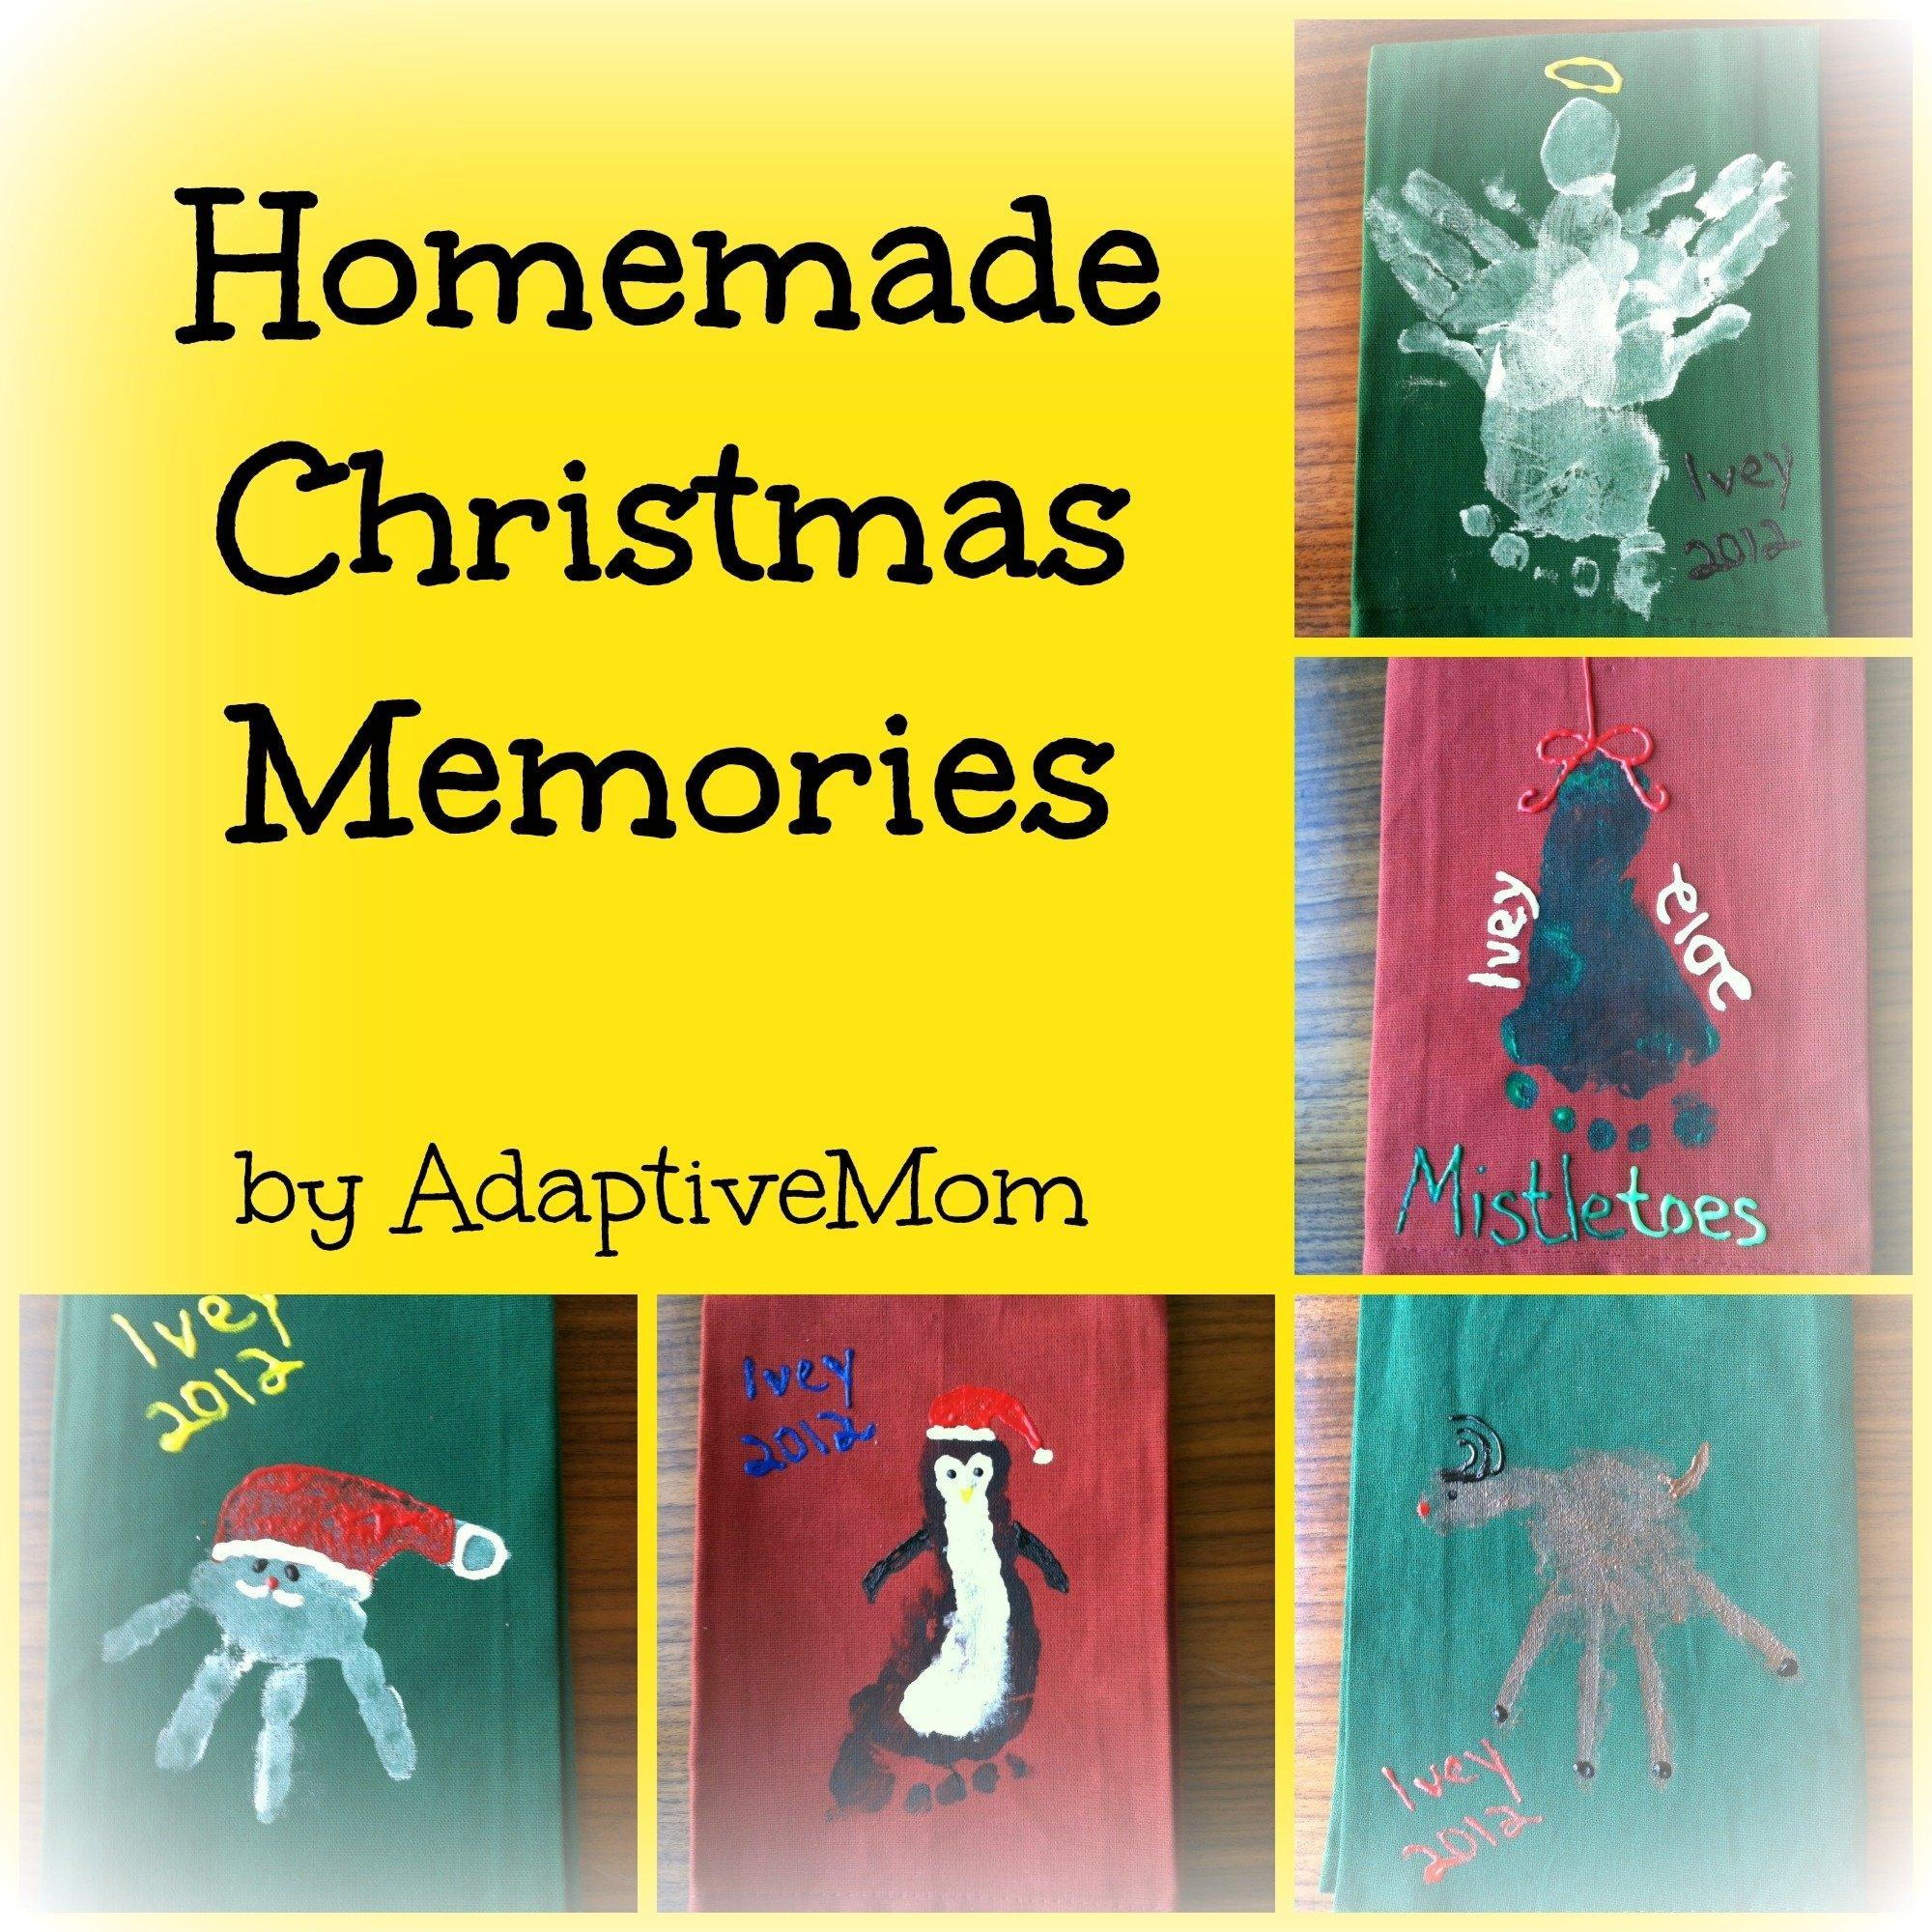 10 Nice Homemade Christmas Gift Ideas For Mom homemade christmas memories the adaptive mom 2020